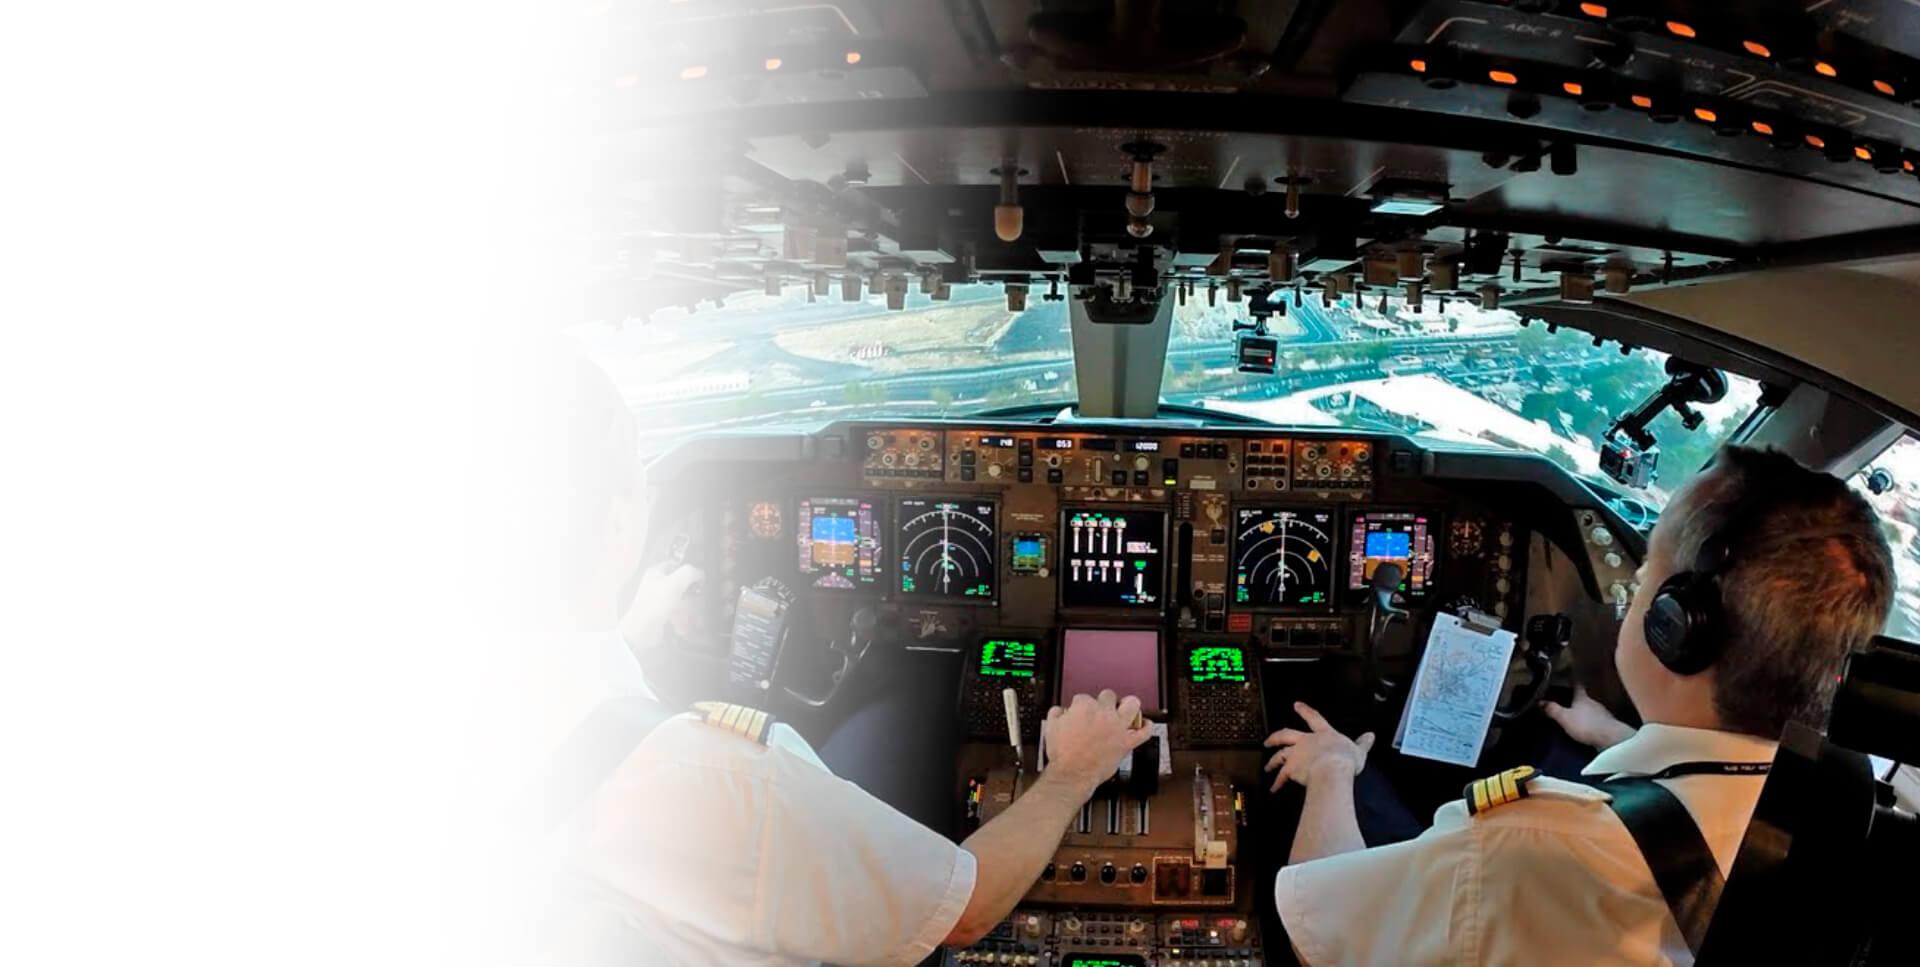 <span class='negritaslide'>Diplomado en CRM y <br />Factores Humanos en aviación.</span>